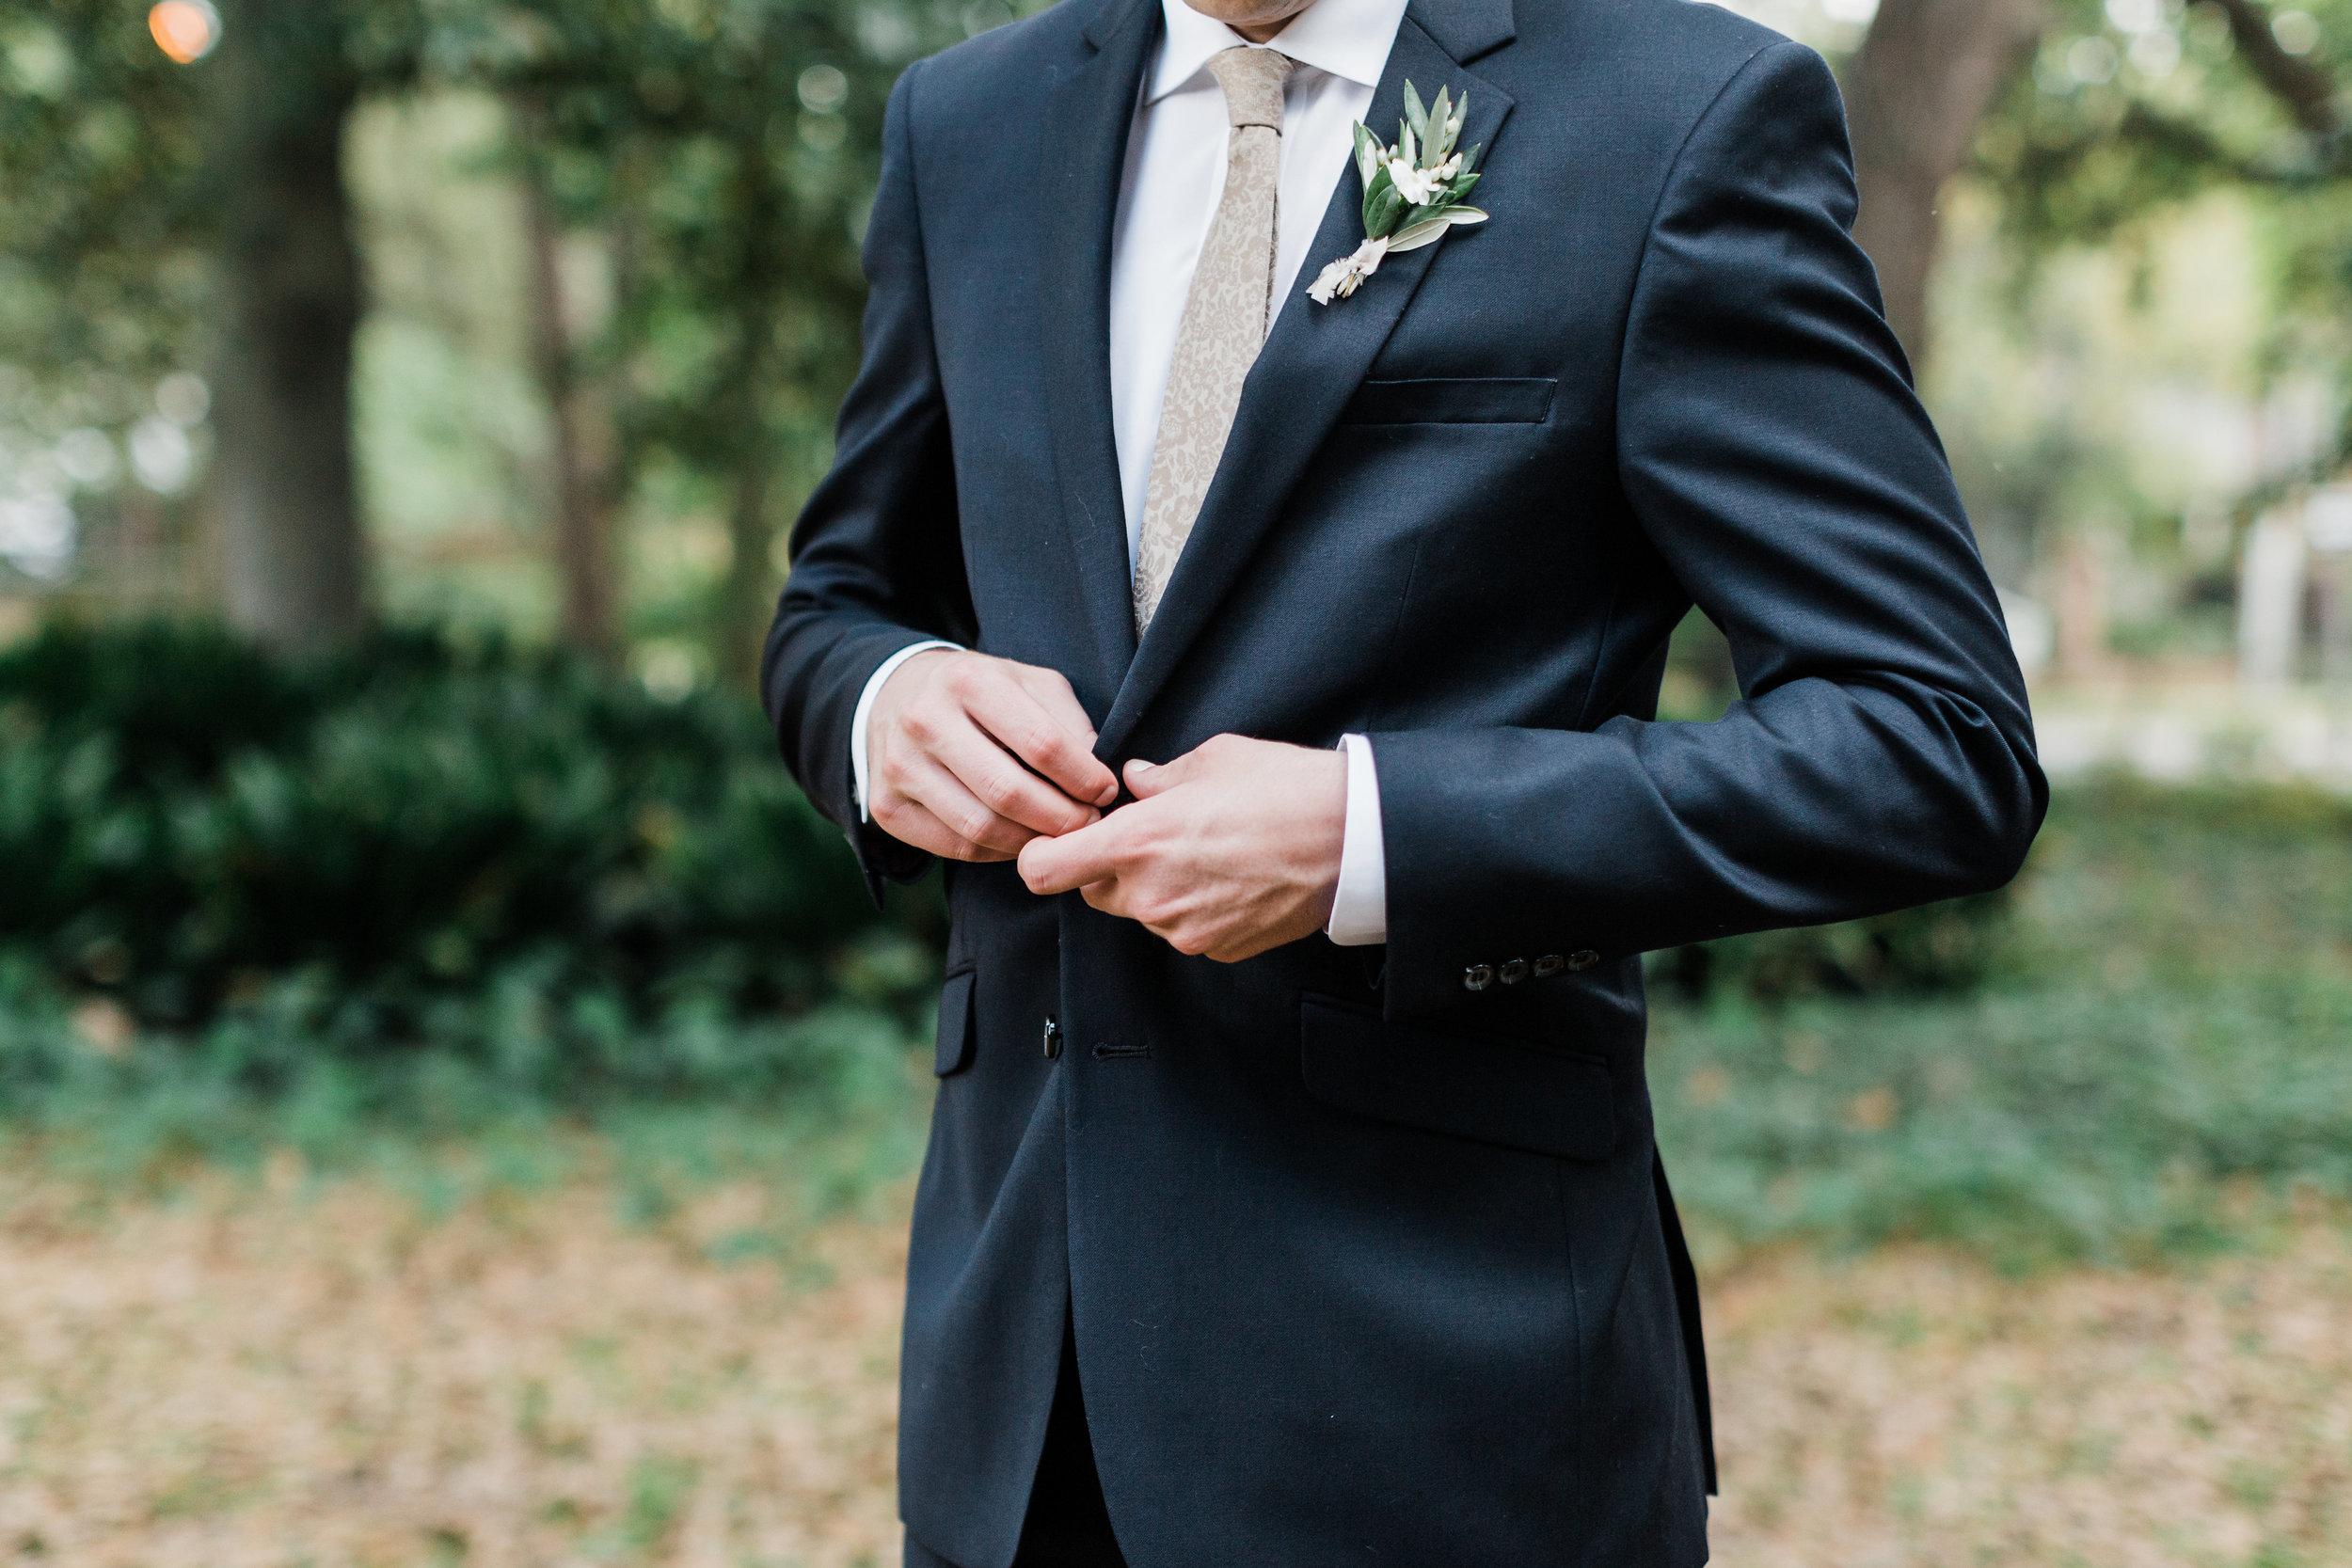 Southern Fete, Southern Wedding, Groom's Tux, Carolynn Seibert Photography